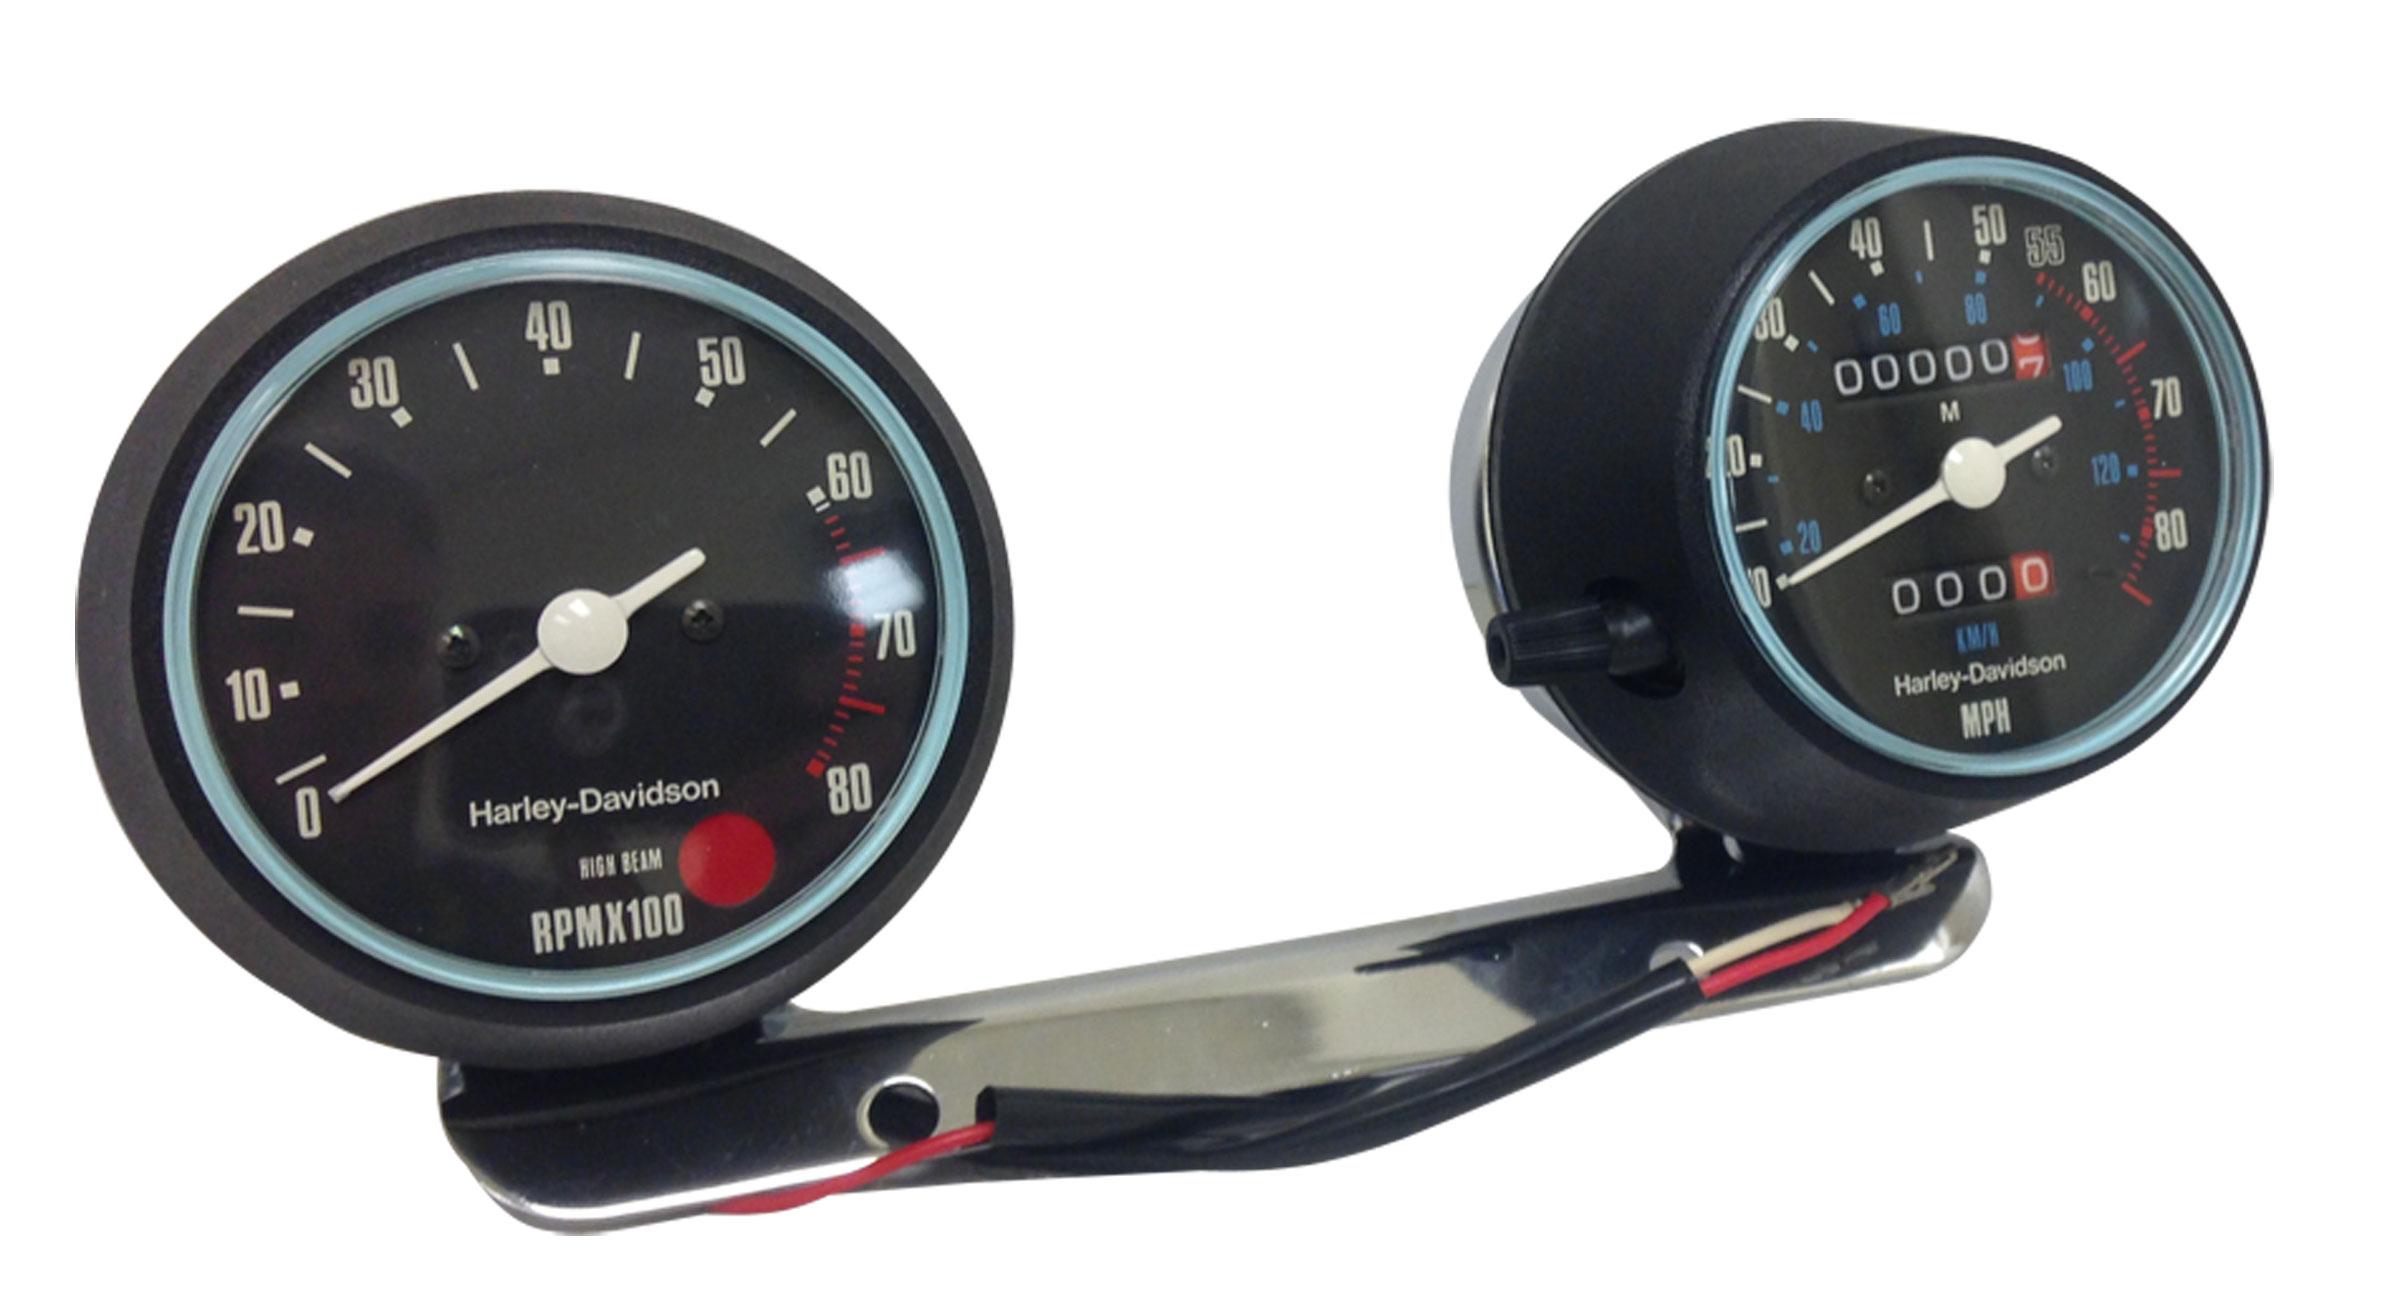 Harley       Davidson    Tach and Speedometer   9205877B   Dixie